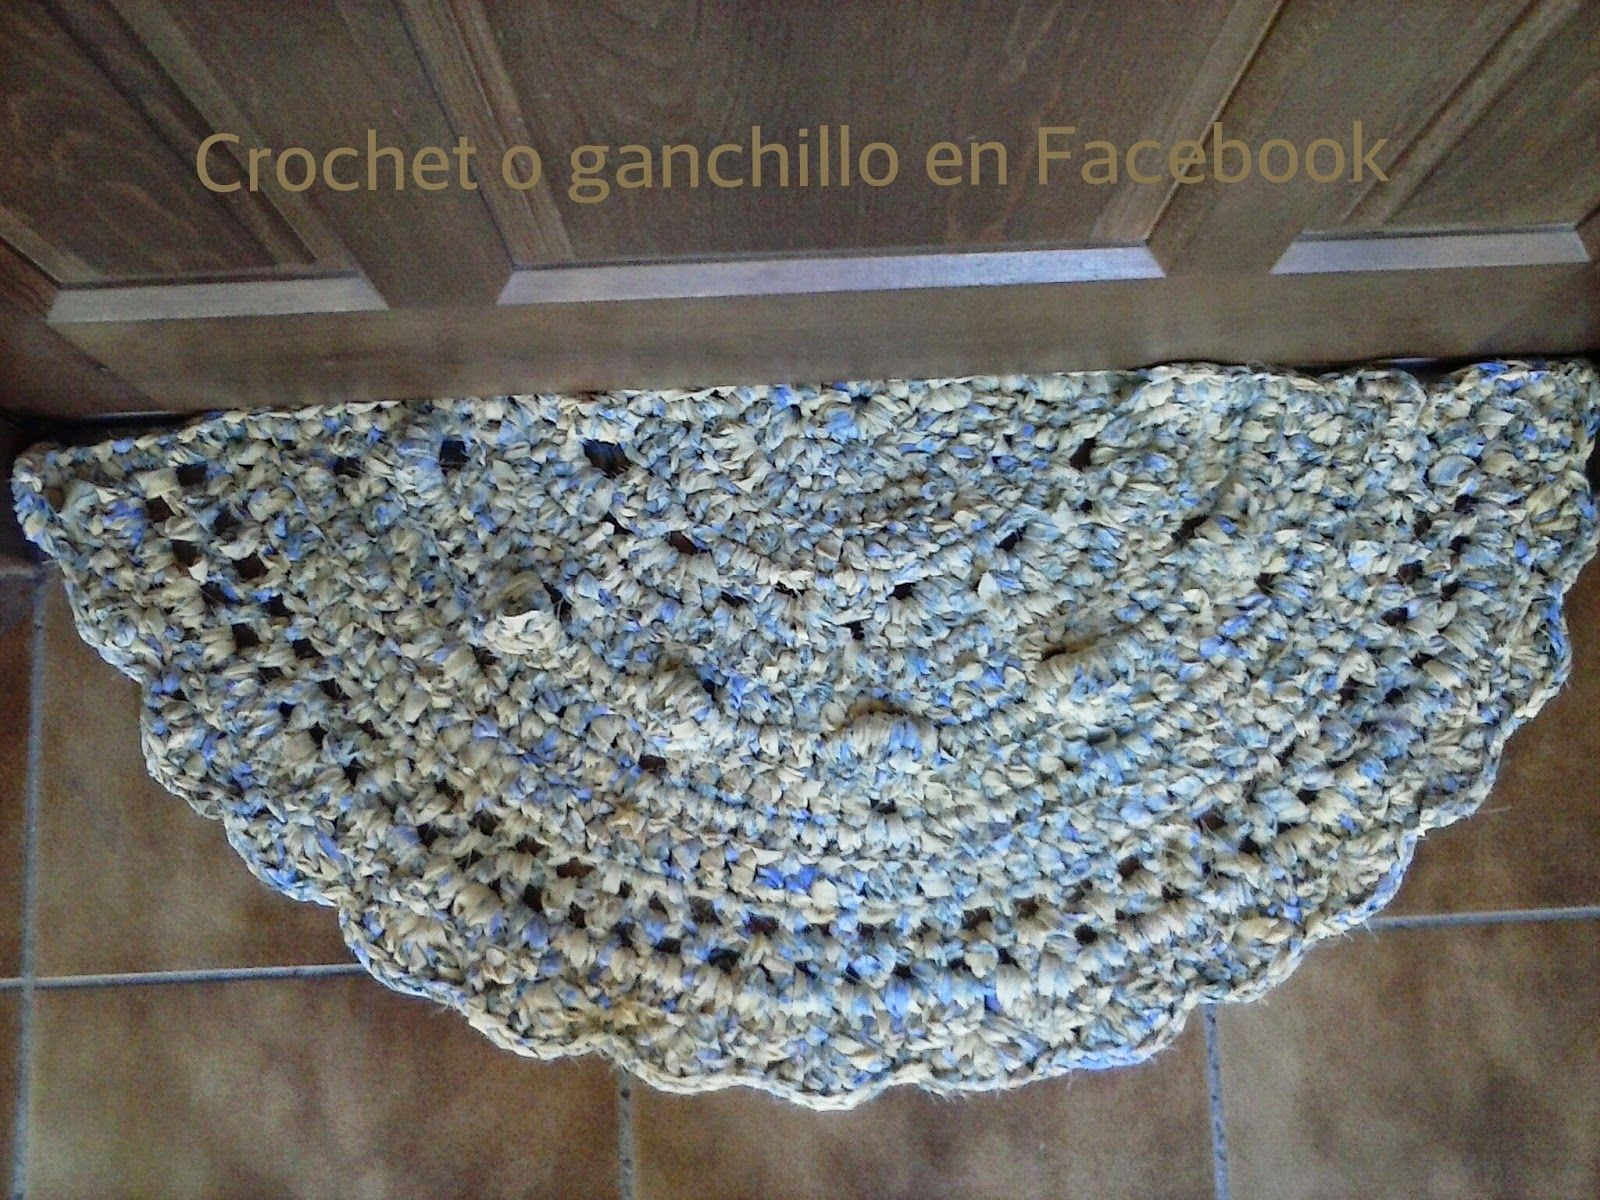 Crochet o ganchillo alfombra de trapillo media luna - Alfombras de trapillo ...